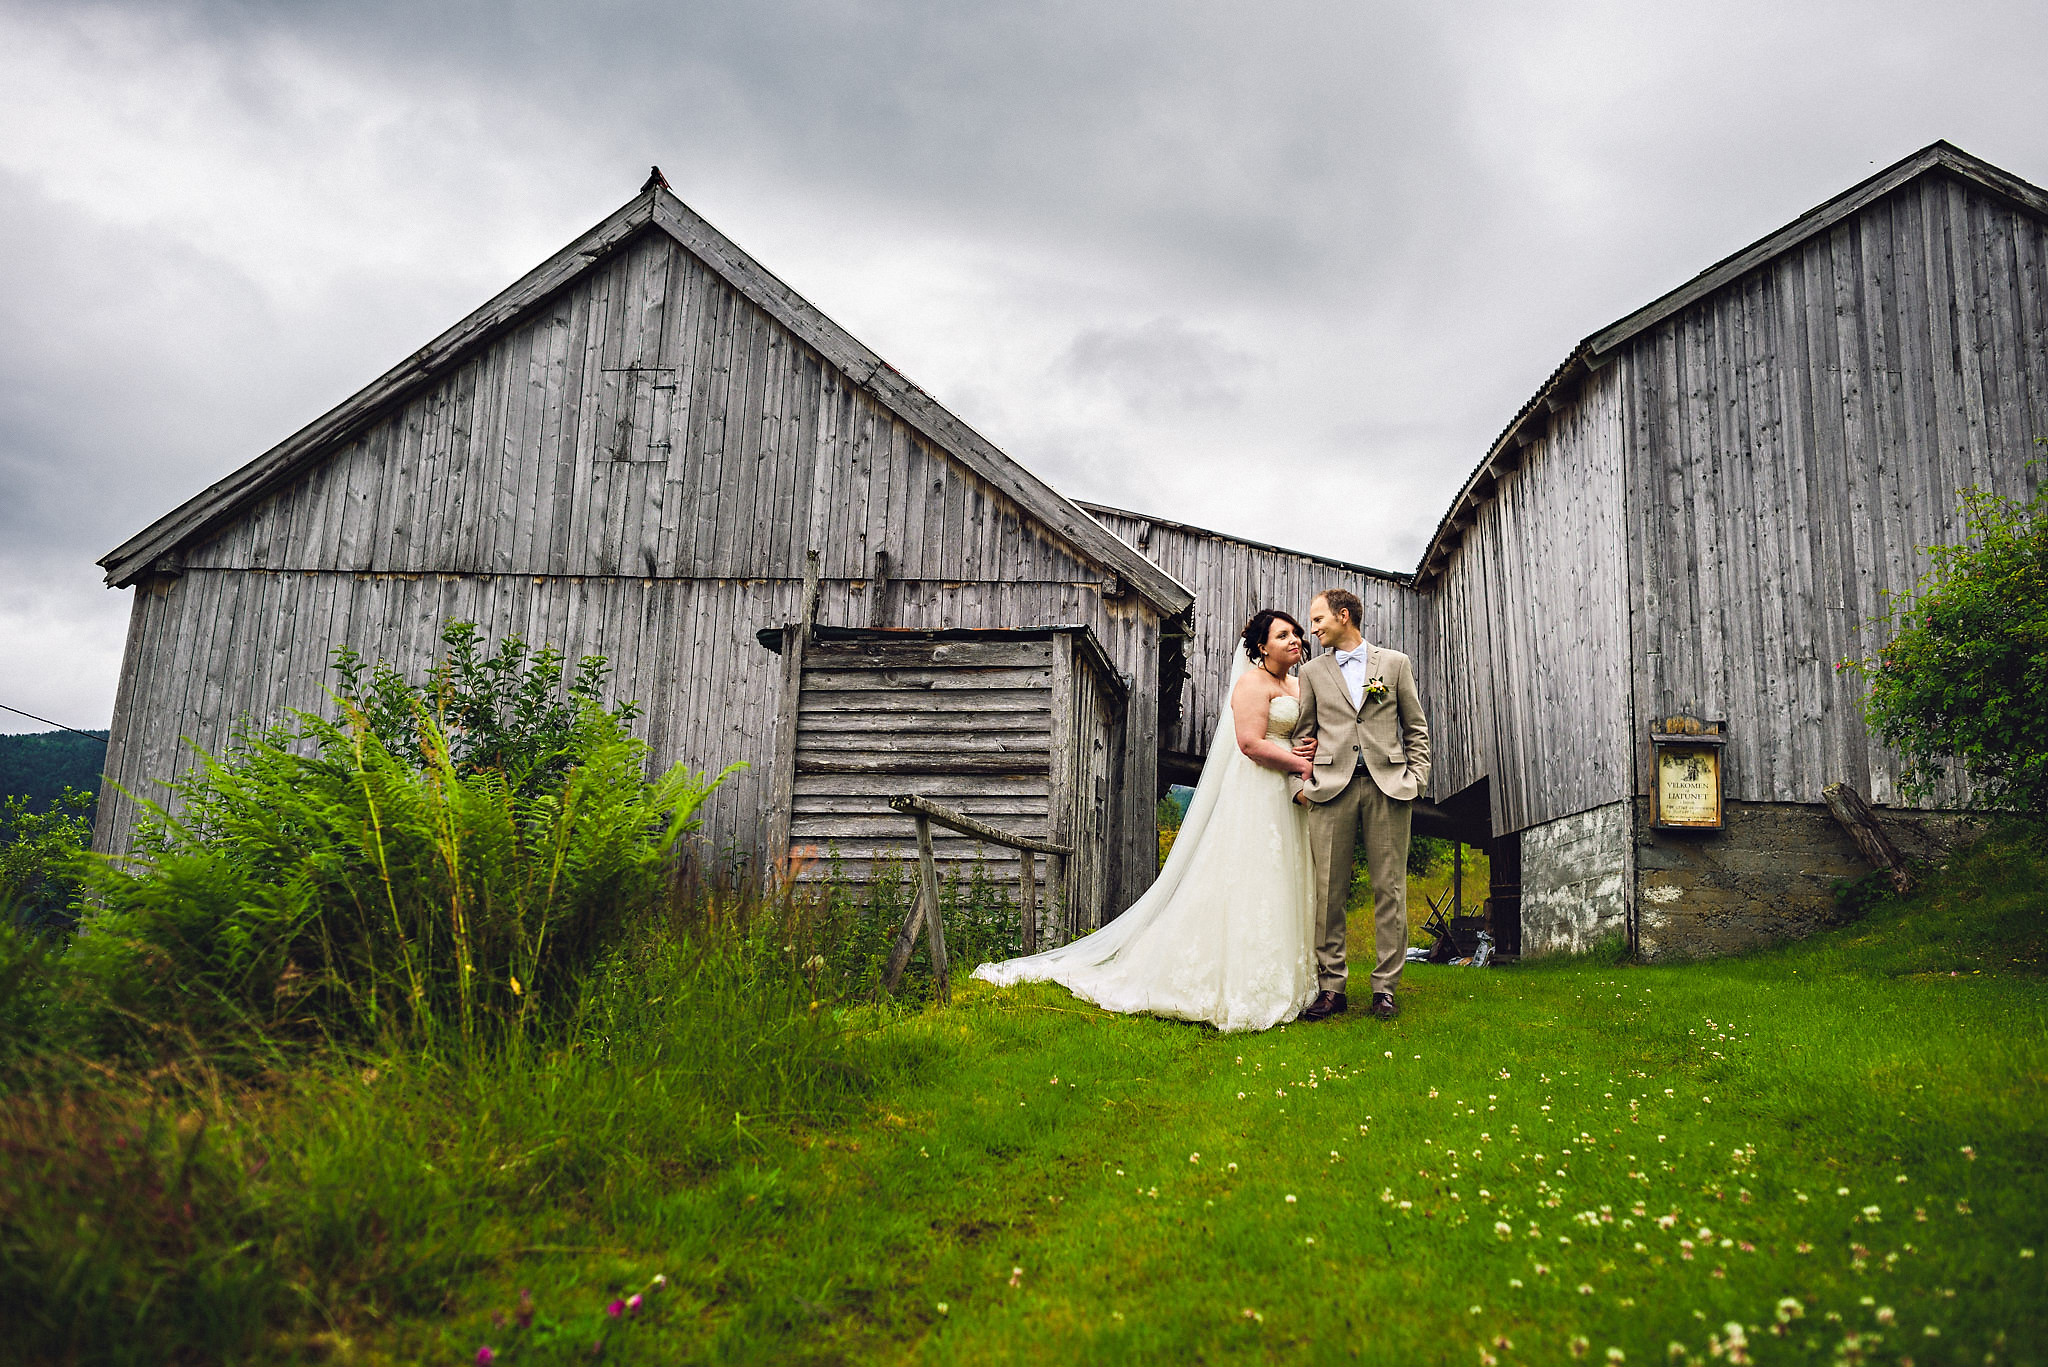 Bryllup på Yrineset i Oldedalen bryllupsfotograf sogn og fjordane-6.jpg